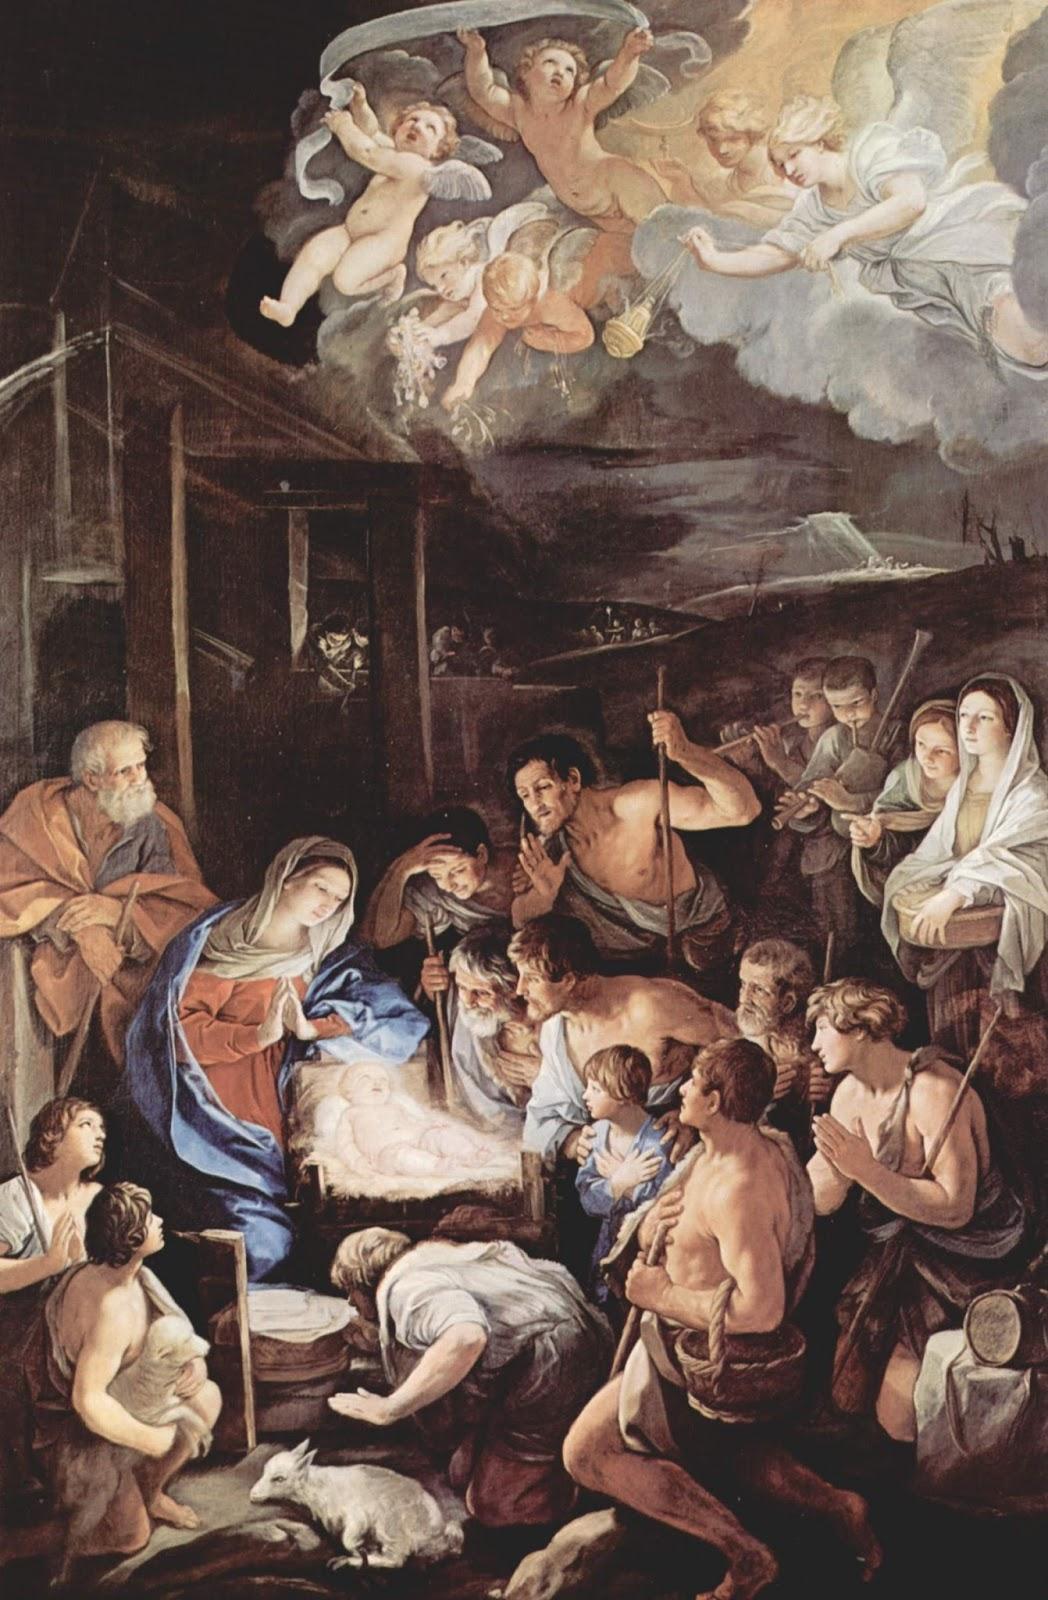 Guido reni baroque era painter tutt 39 art pittura for Famous artist in baroque period